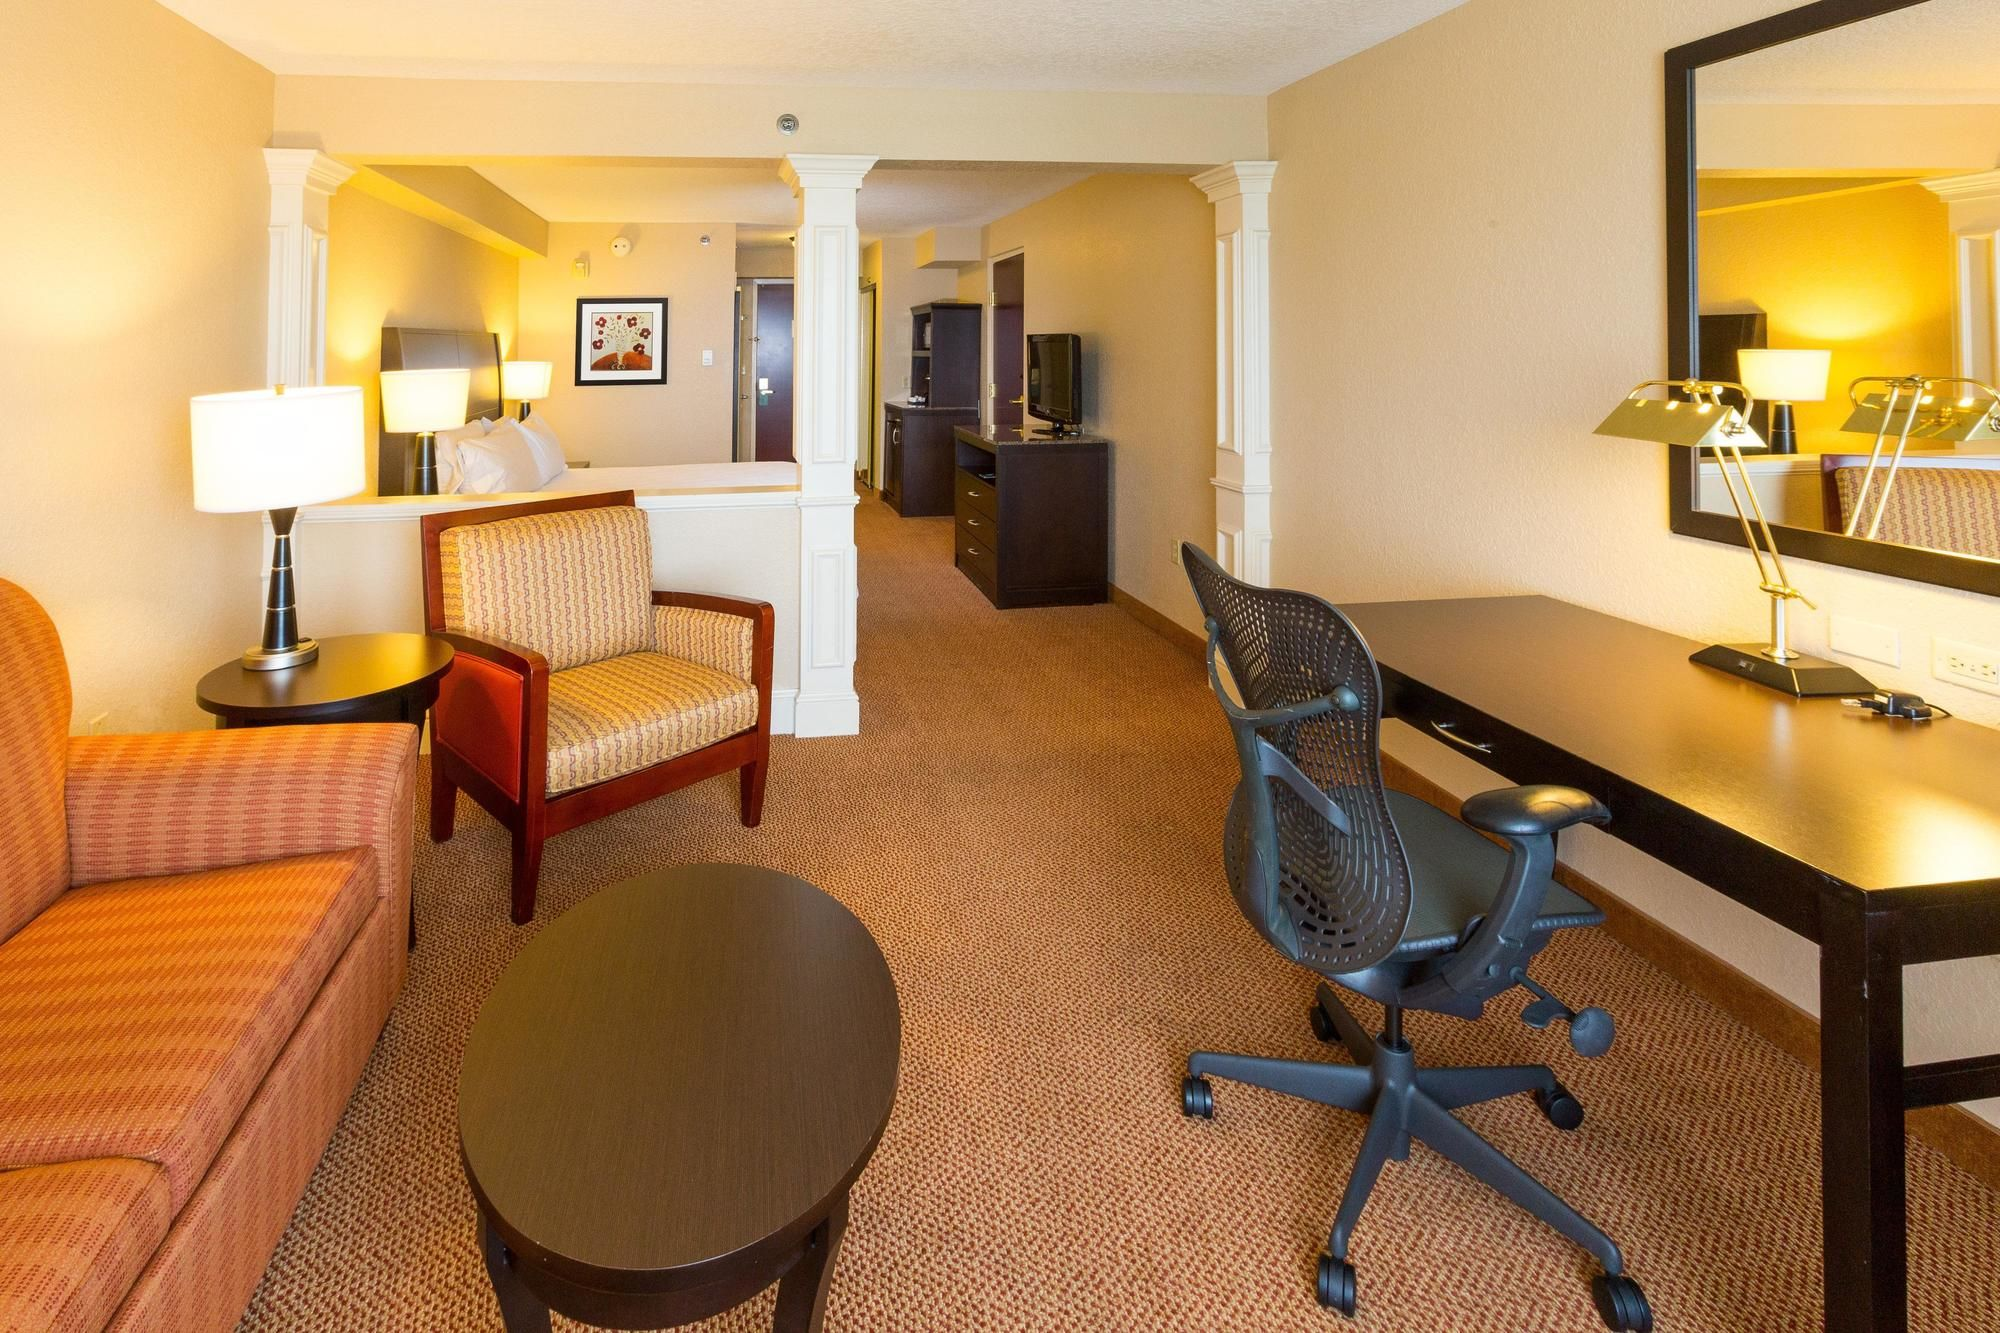 Discount Coupon for Hilton Garden Inn Daytona Beach Airport in ...